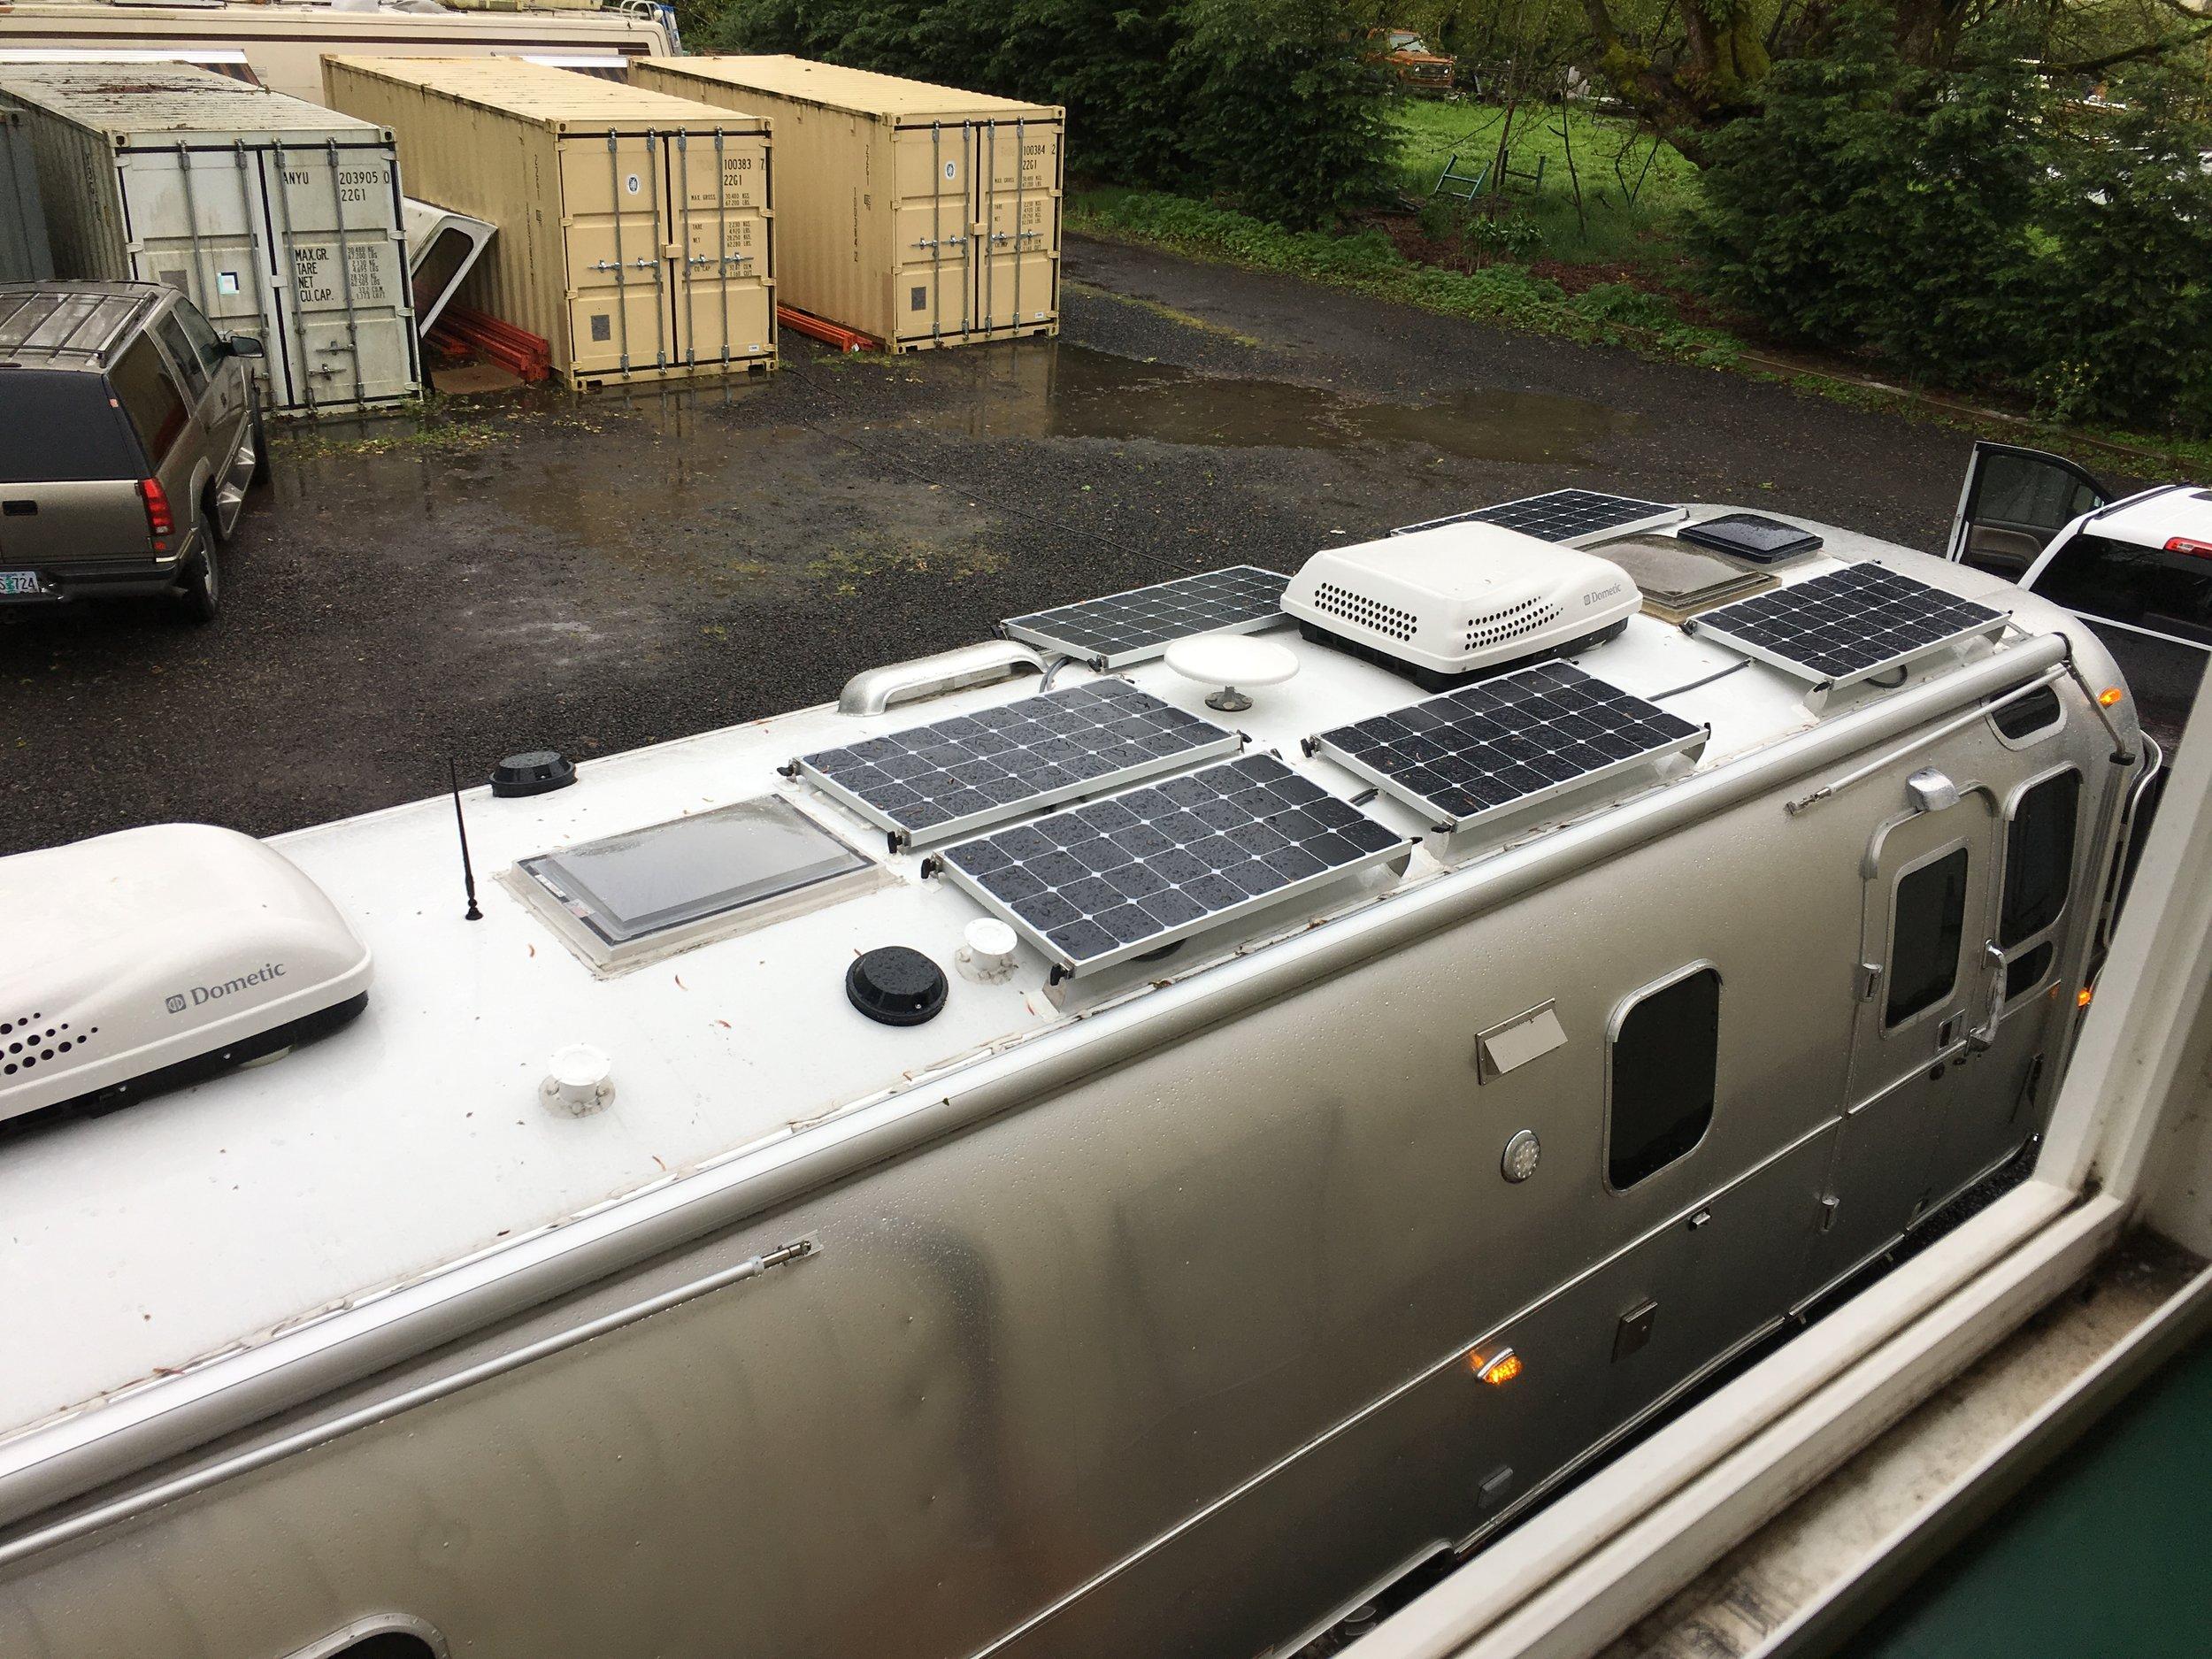 600W of solar panels